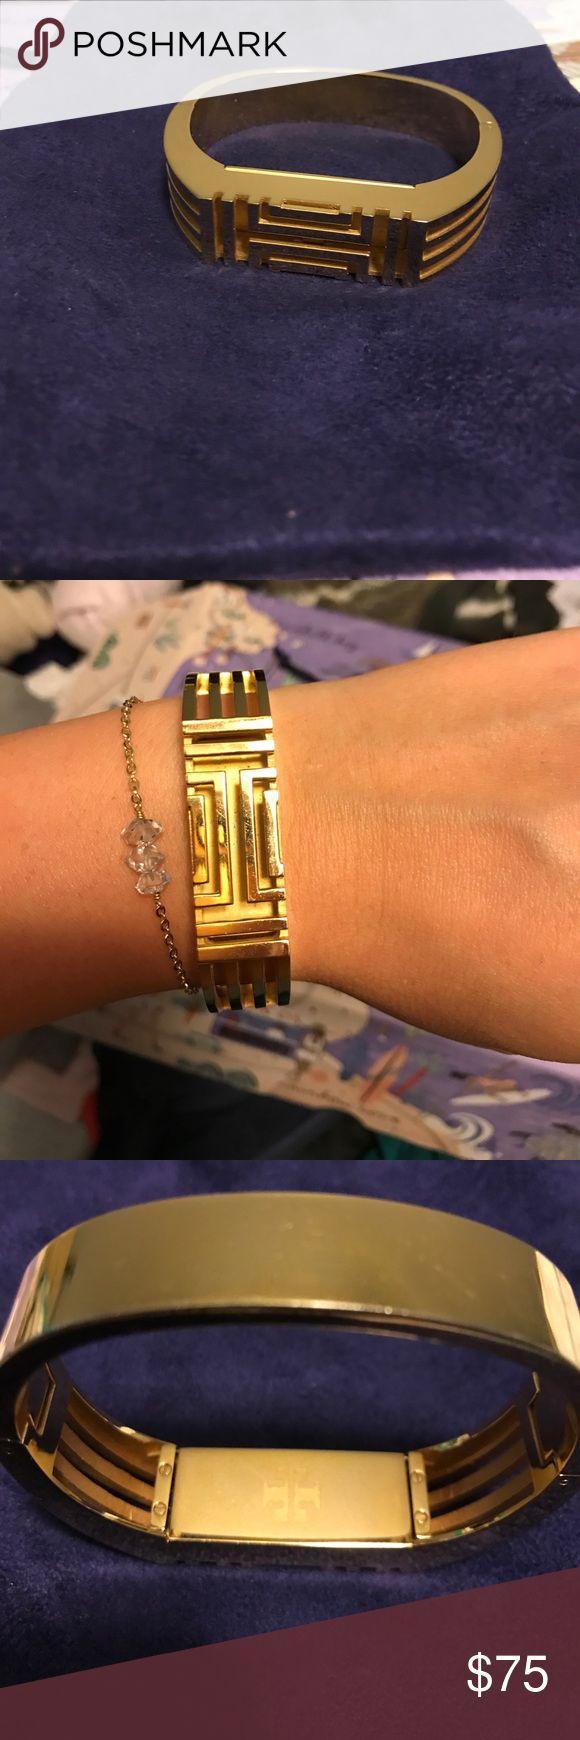 Tory Butch Fitbit bracelet (FITBIT NOT INCLUDED) Gold Tory Burch Fitbit Bracelet Tory Burch Jewelry Bracelets